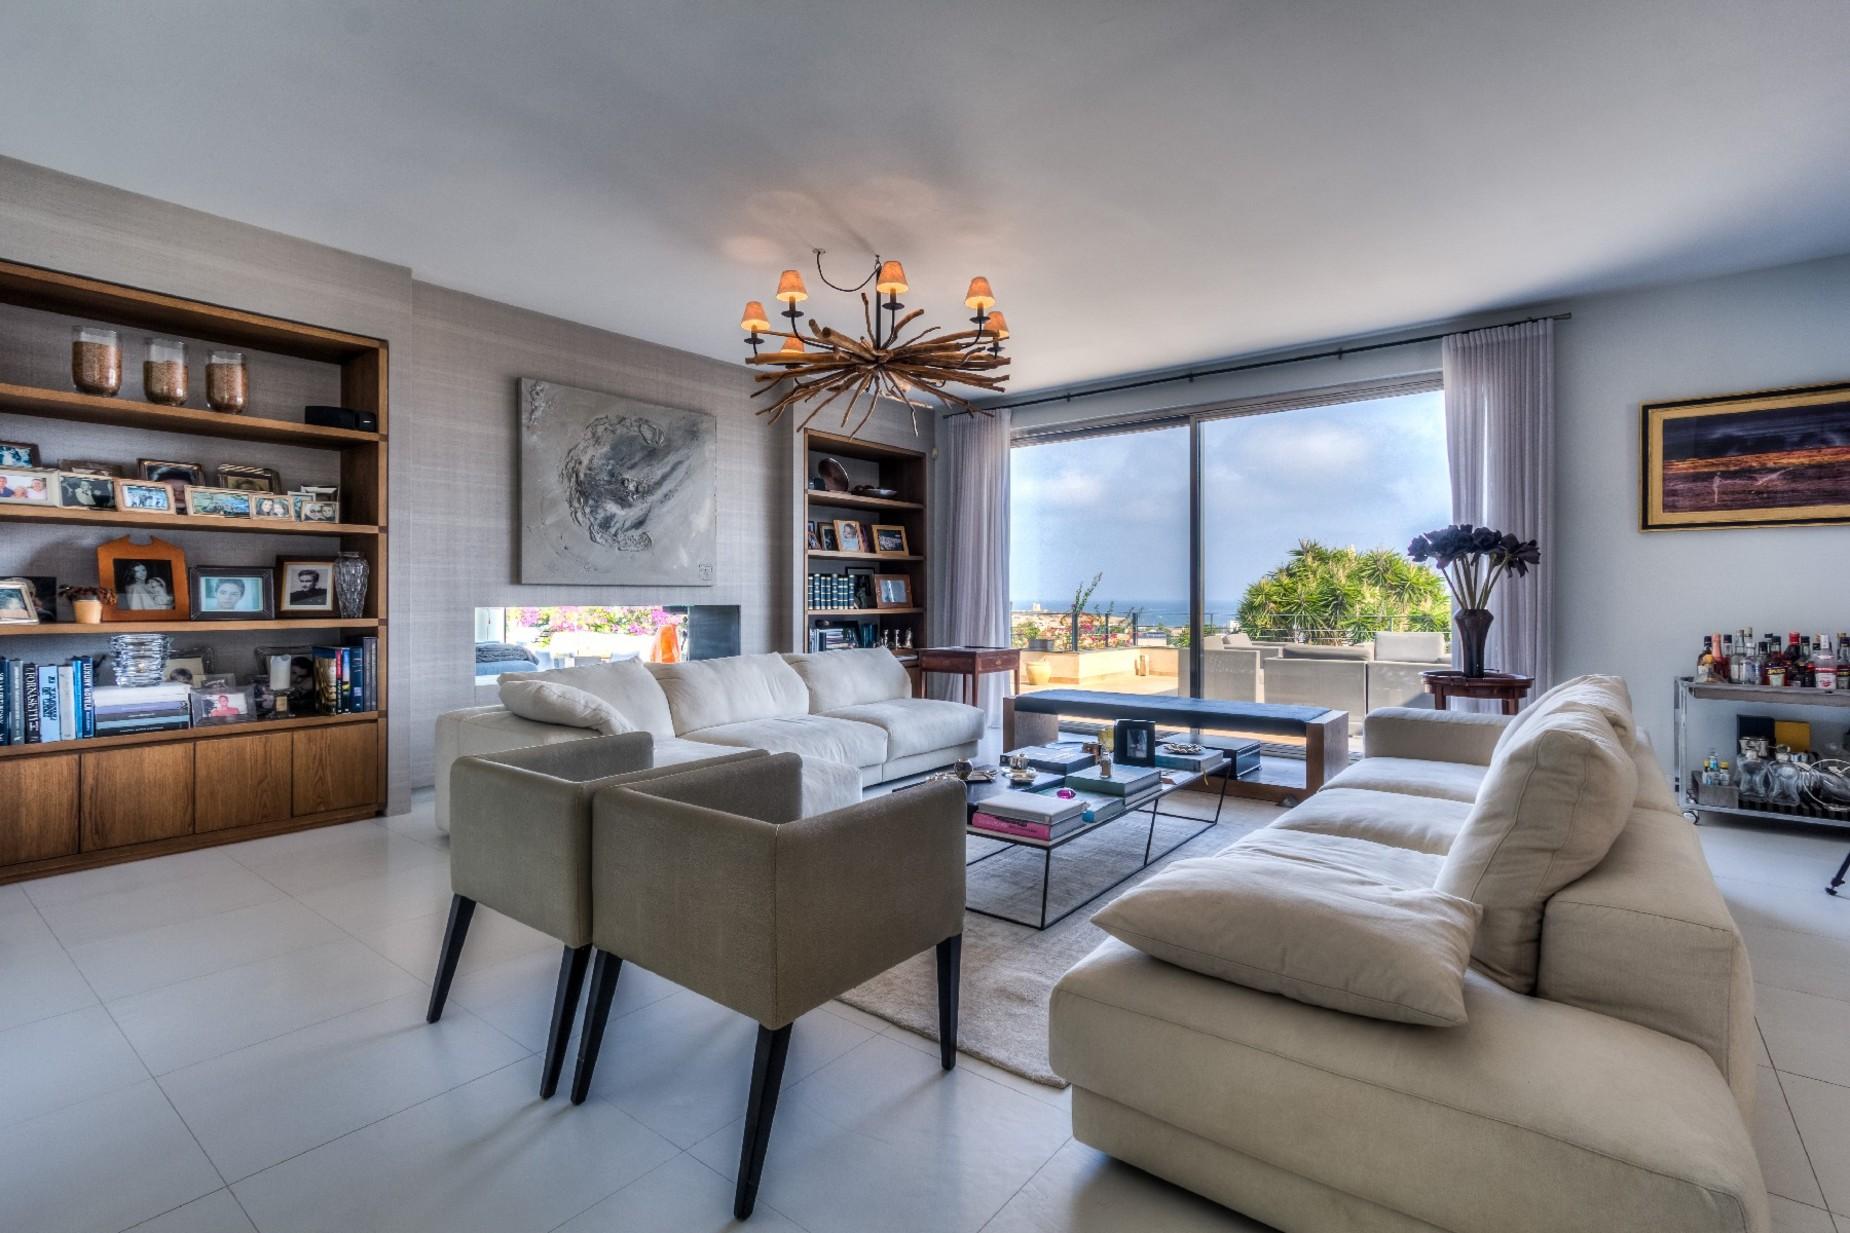 7 bed Villa For Sale in Bahar ic-Caghaq, Bahar ic-Caghaq - thumb 3